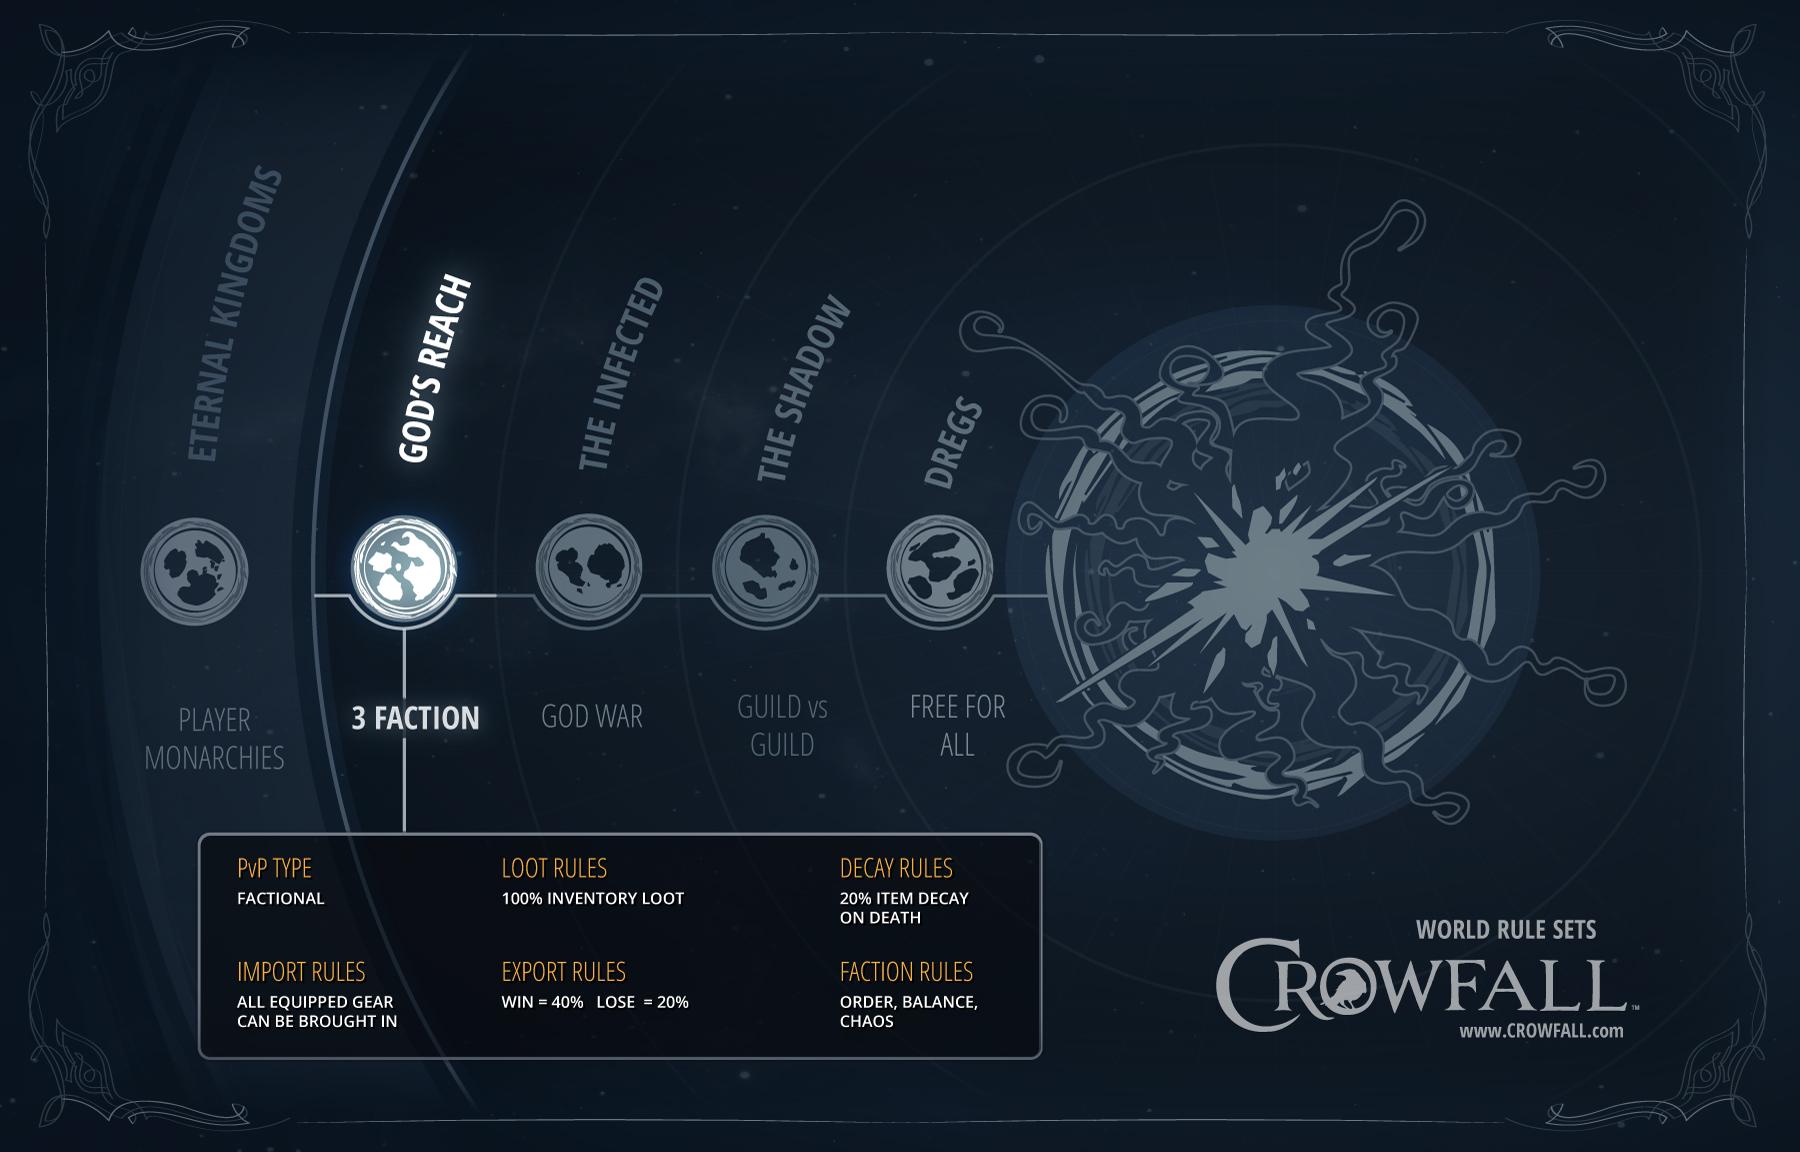 Crowfall_WorldRules_2.jpg